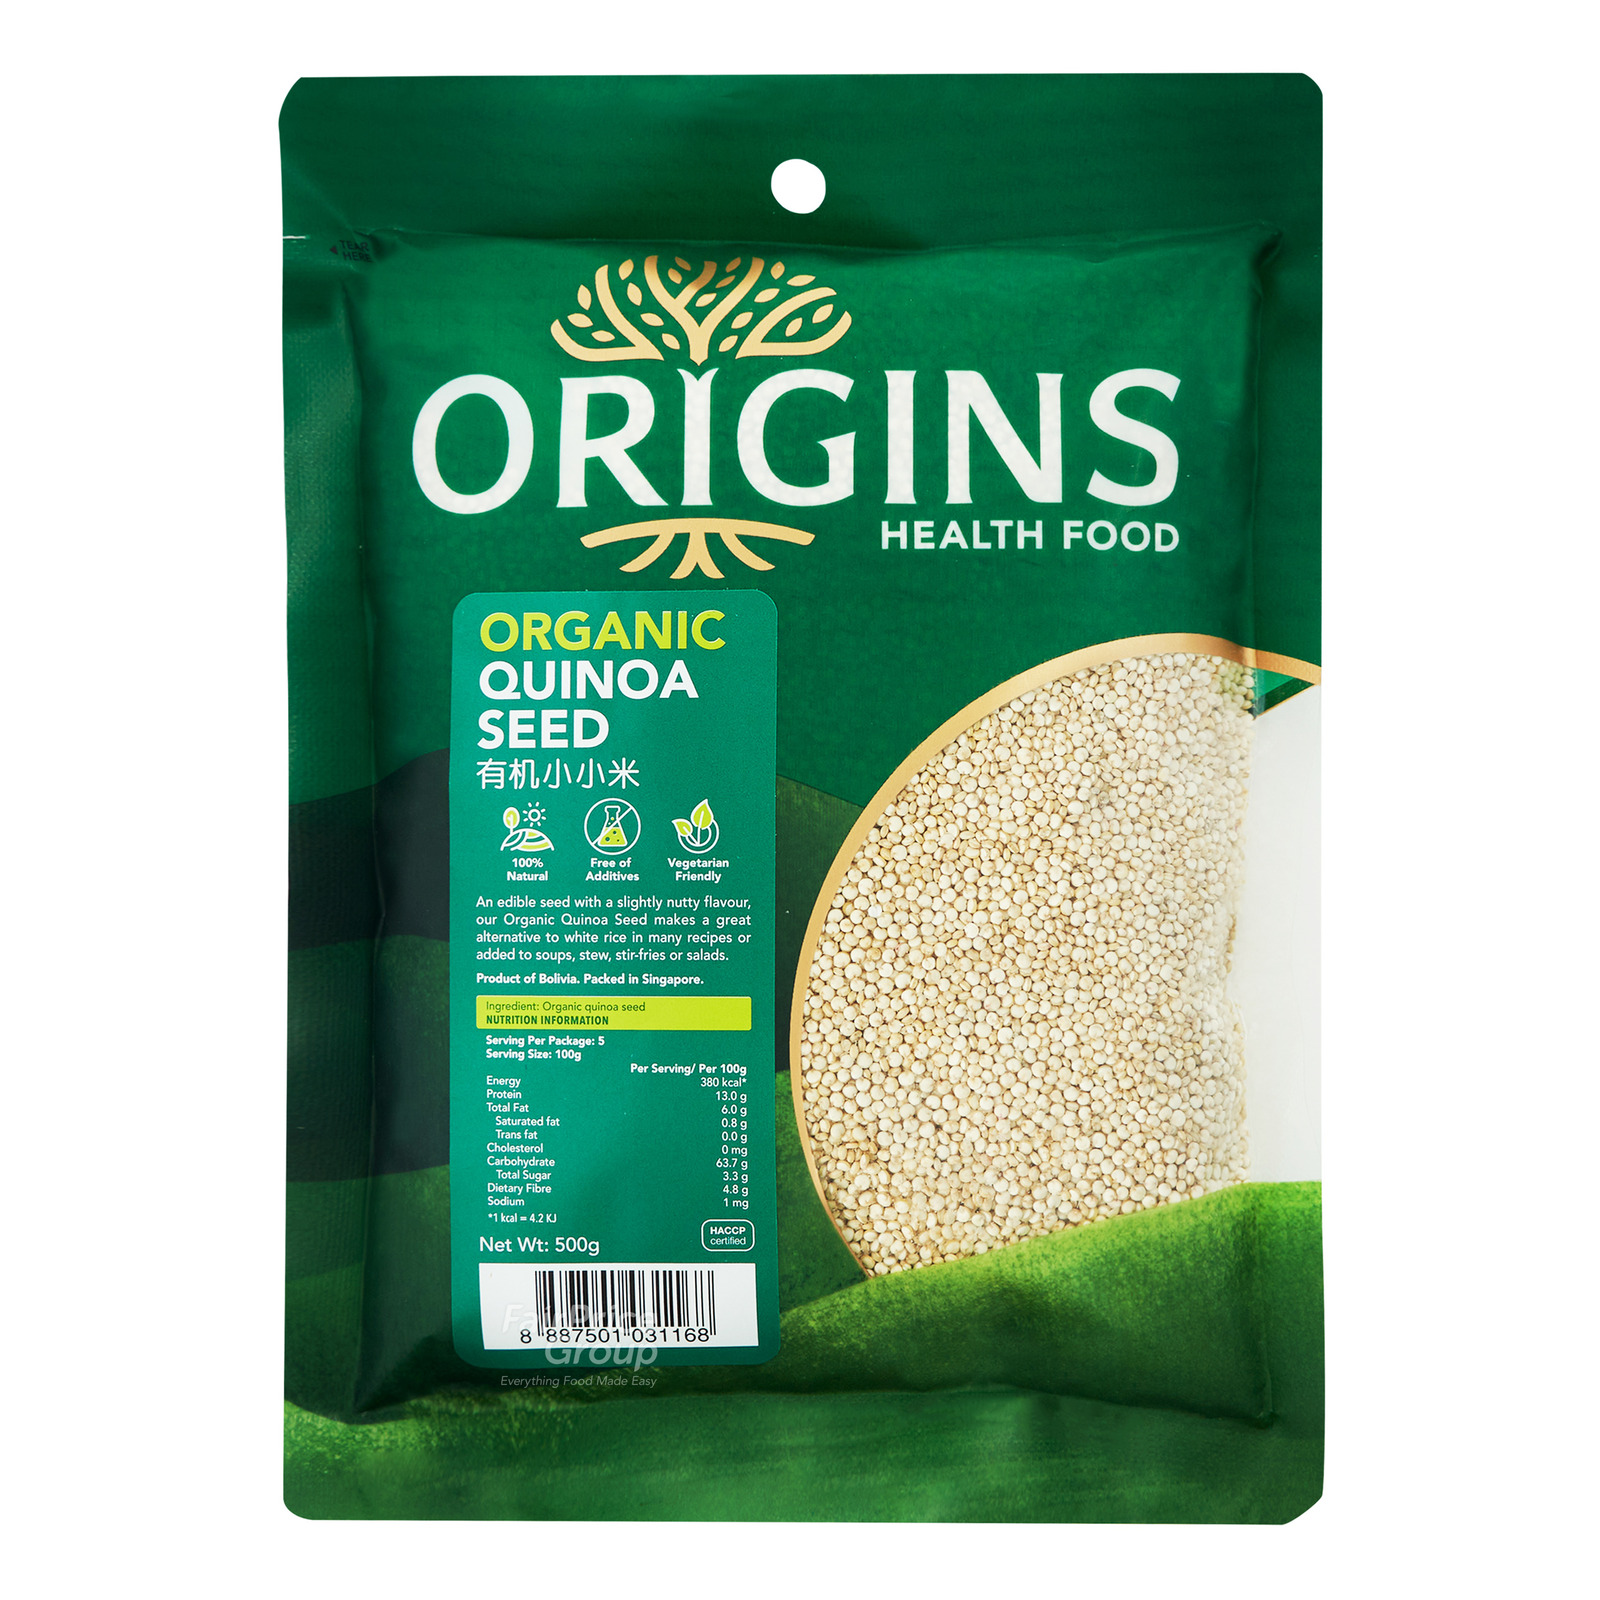 Origins Healthfood Organic Quinoa Seed